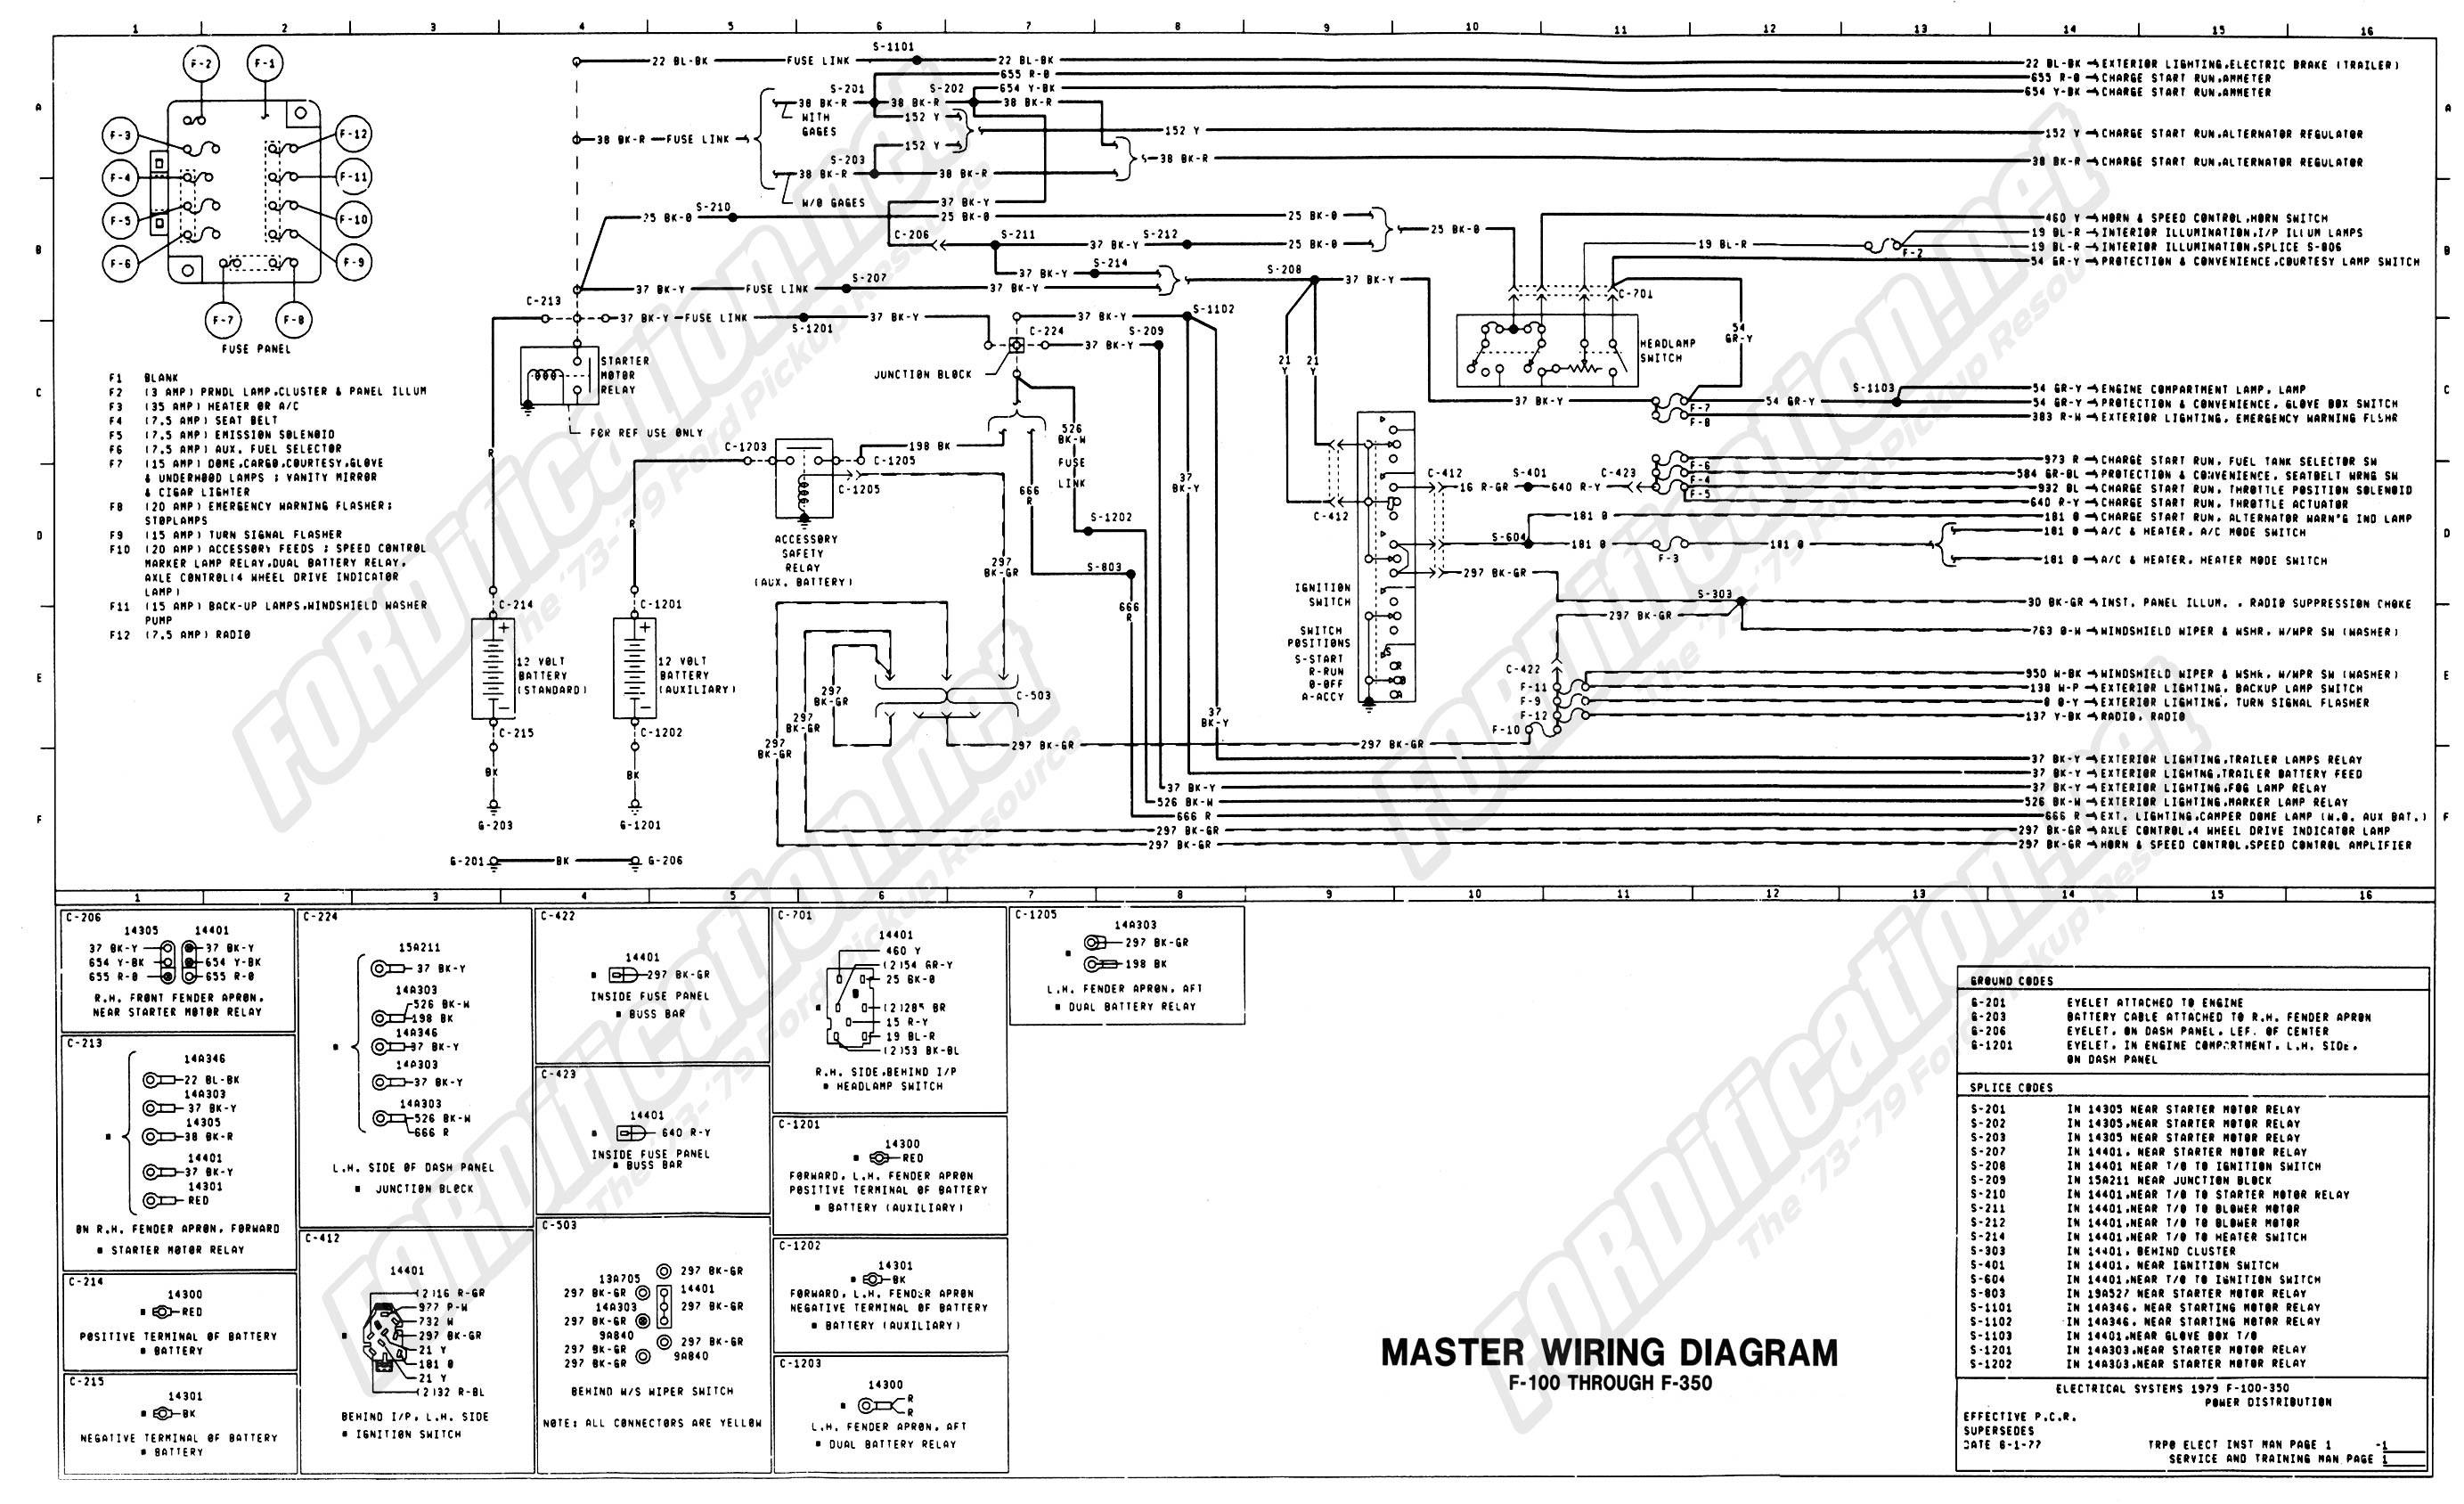 Stupendous Wrg 7297 Ford F250 Solenoid Wiring Wiring Cloud Loplapiotaidewilluminateatxorg